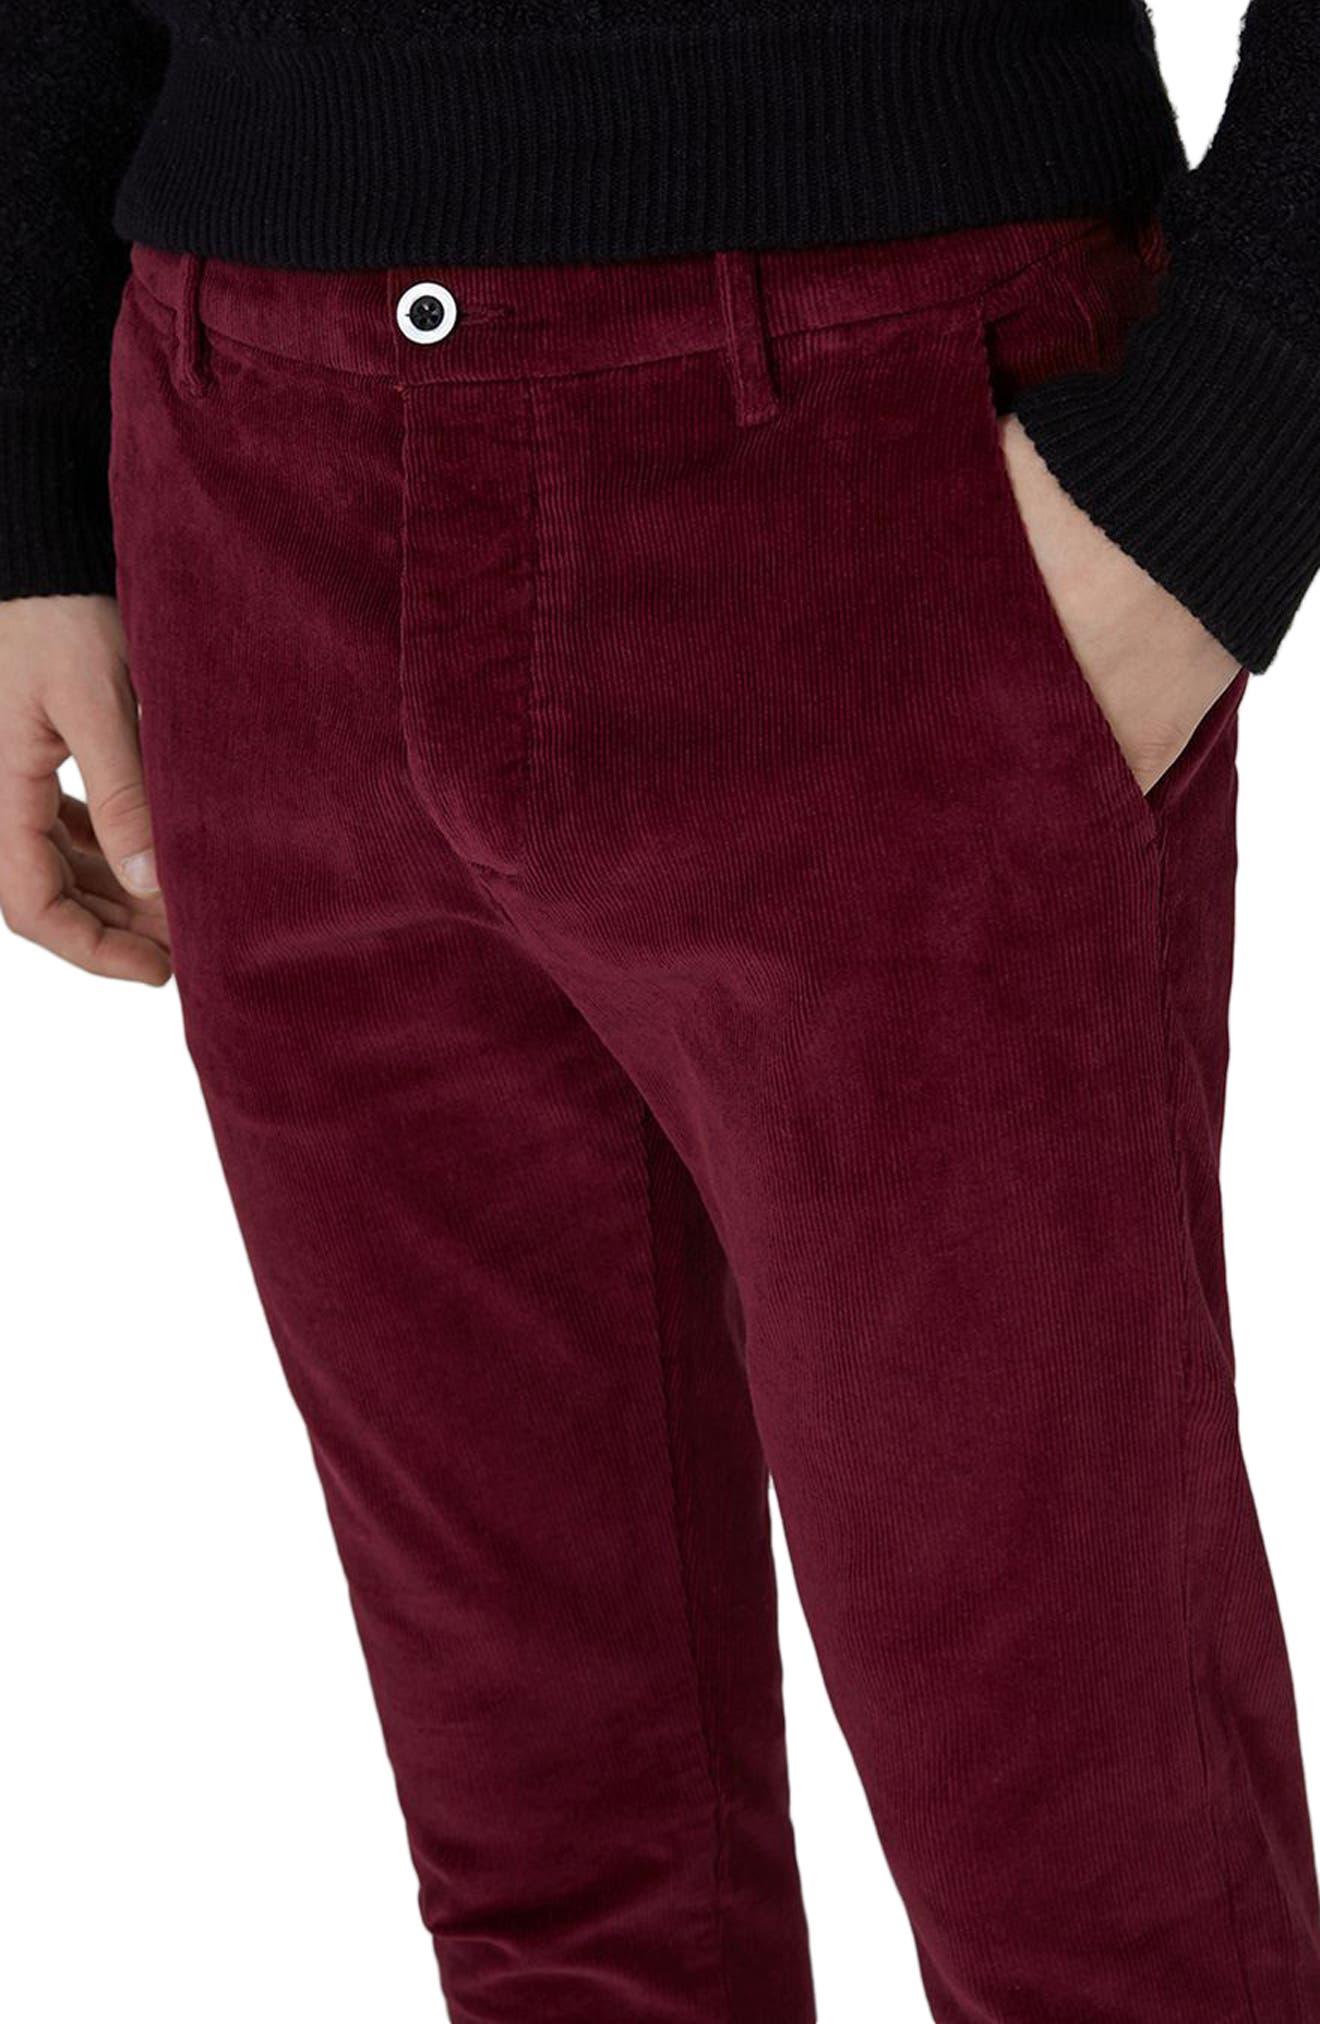 Skinny Fit Corduroy Trousers,                             Alternate thumbnail 3, color,                             Burgundy